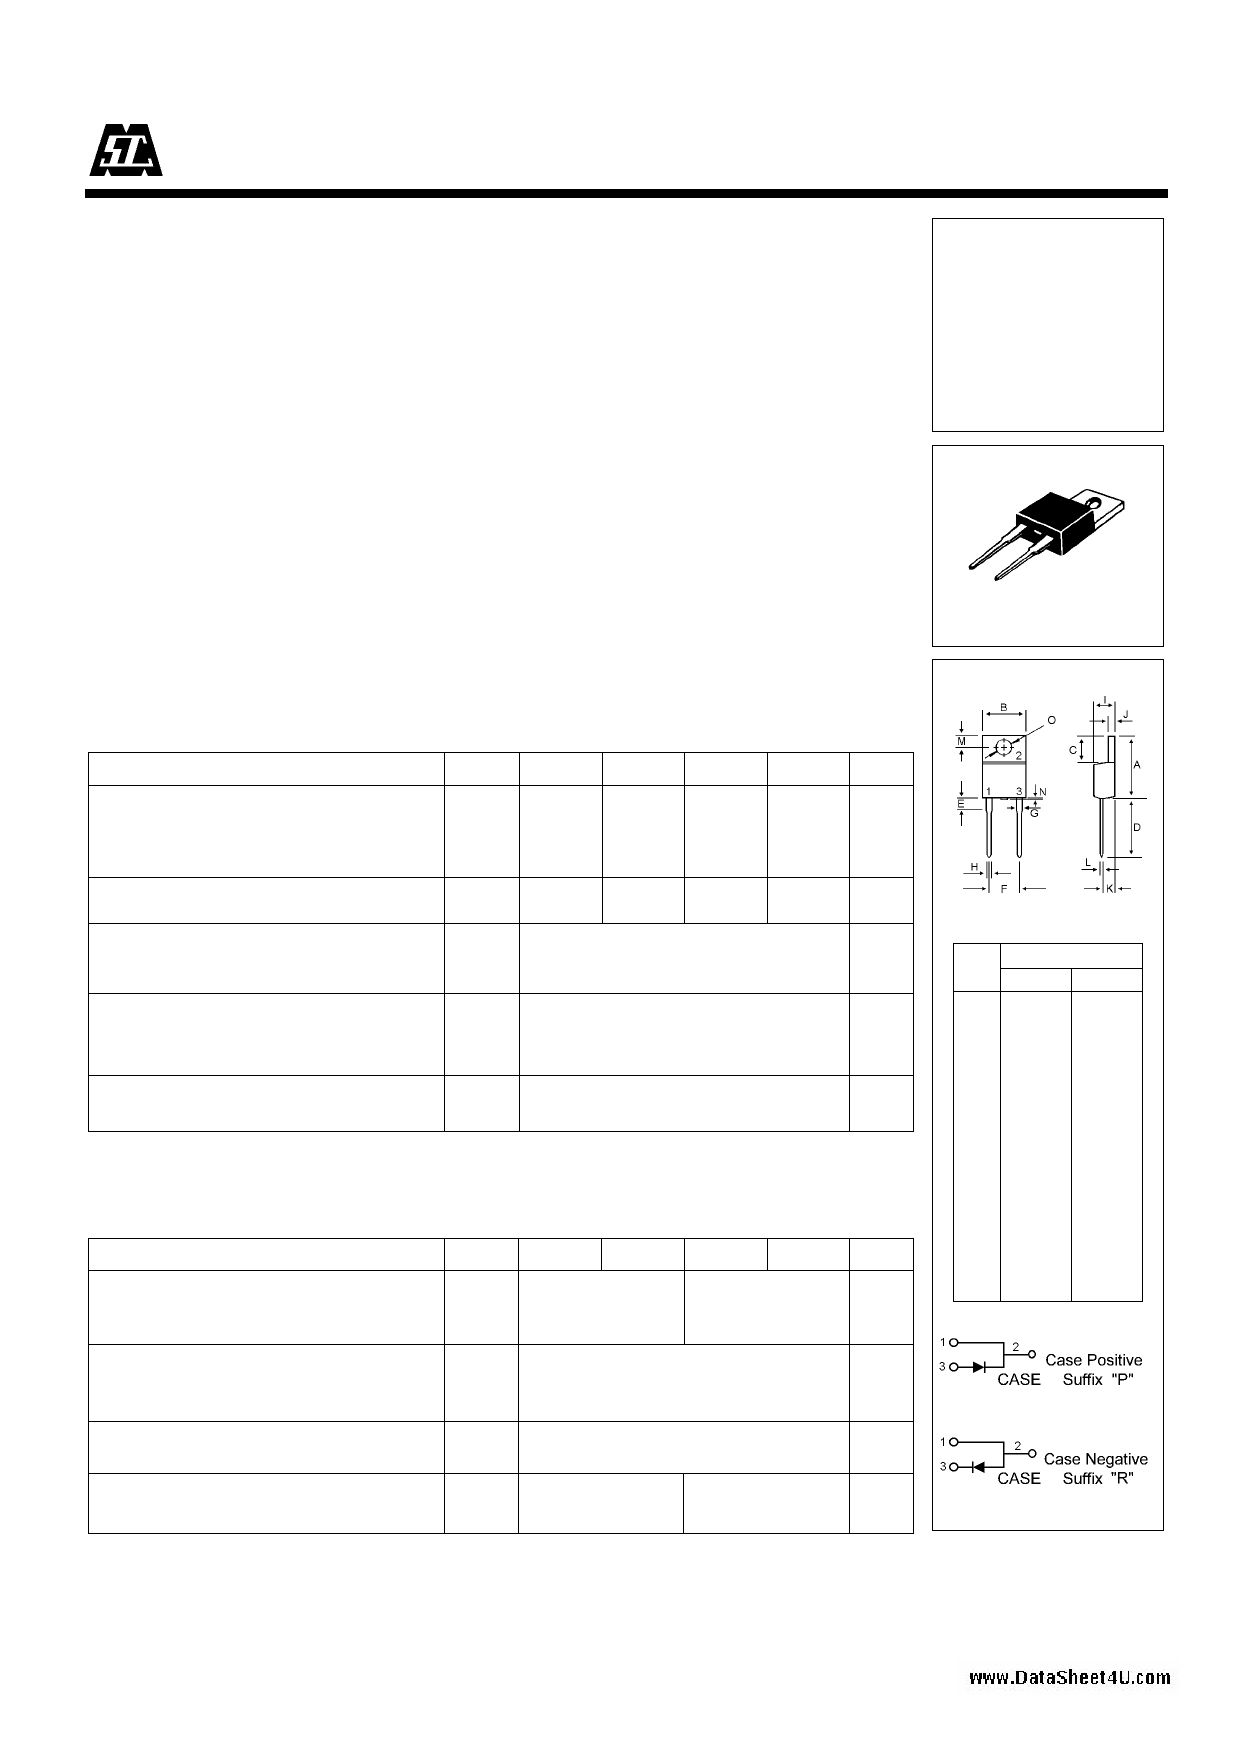 U05A50 datasheet